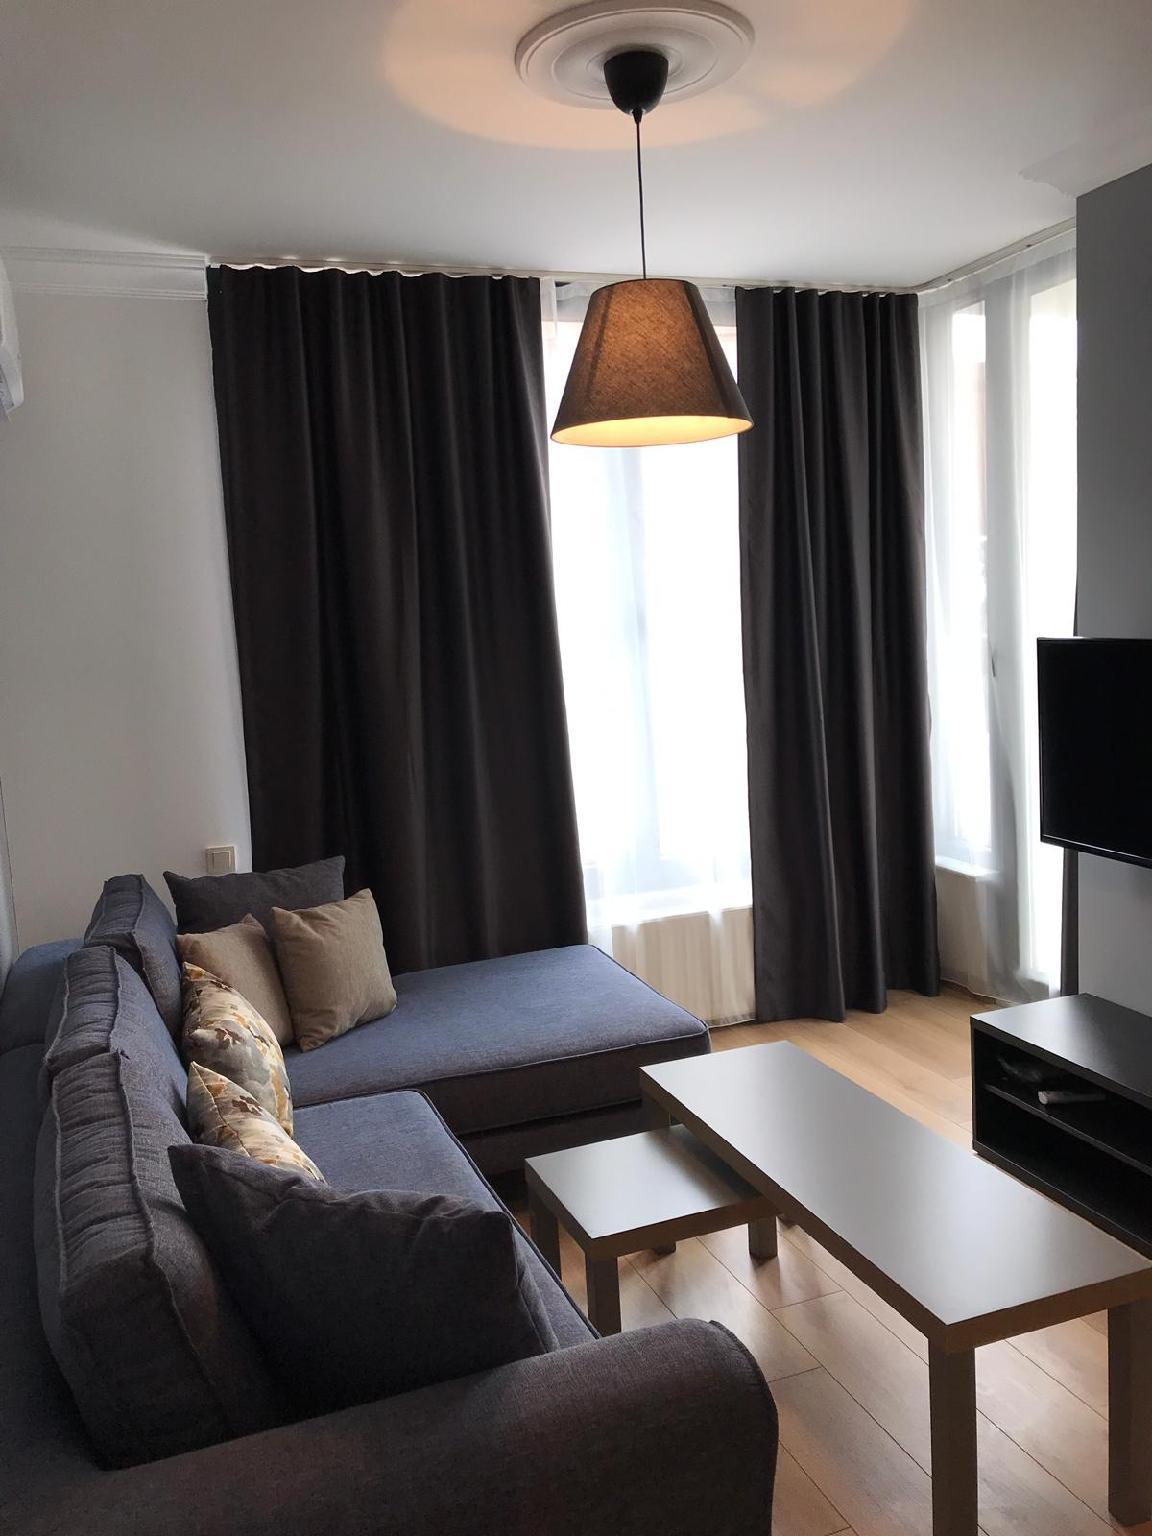 MAS Suites Apartments  City Center 2bedroom Haneen